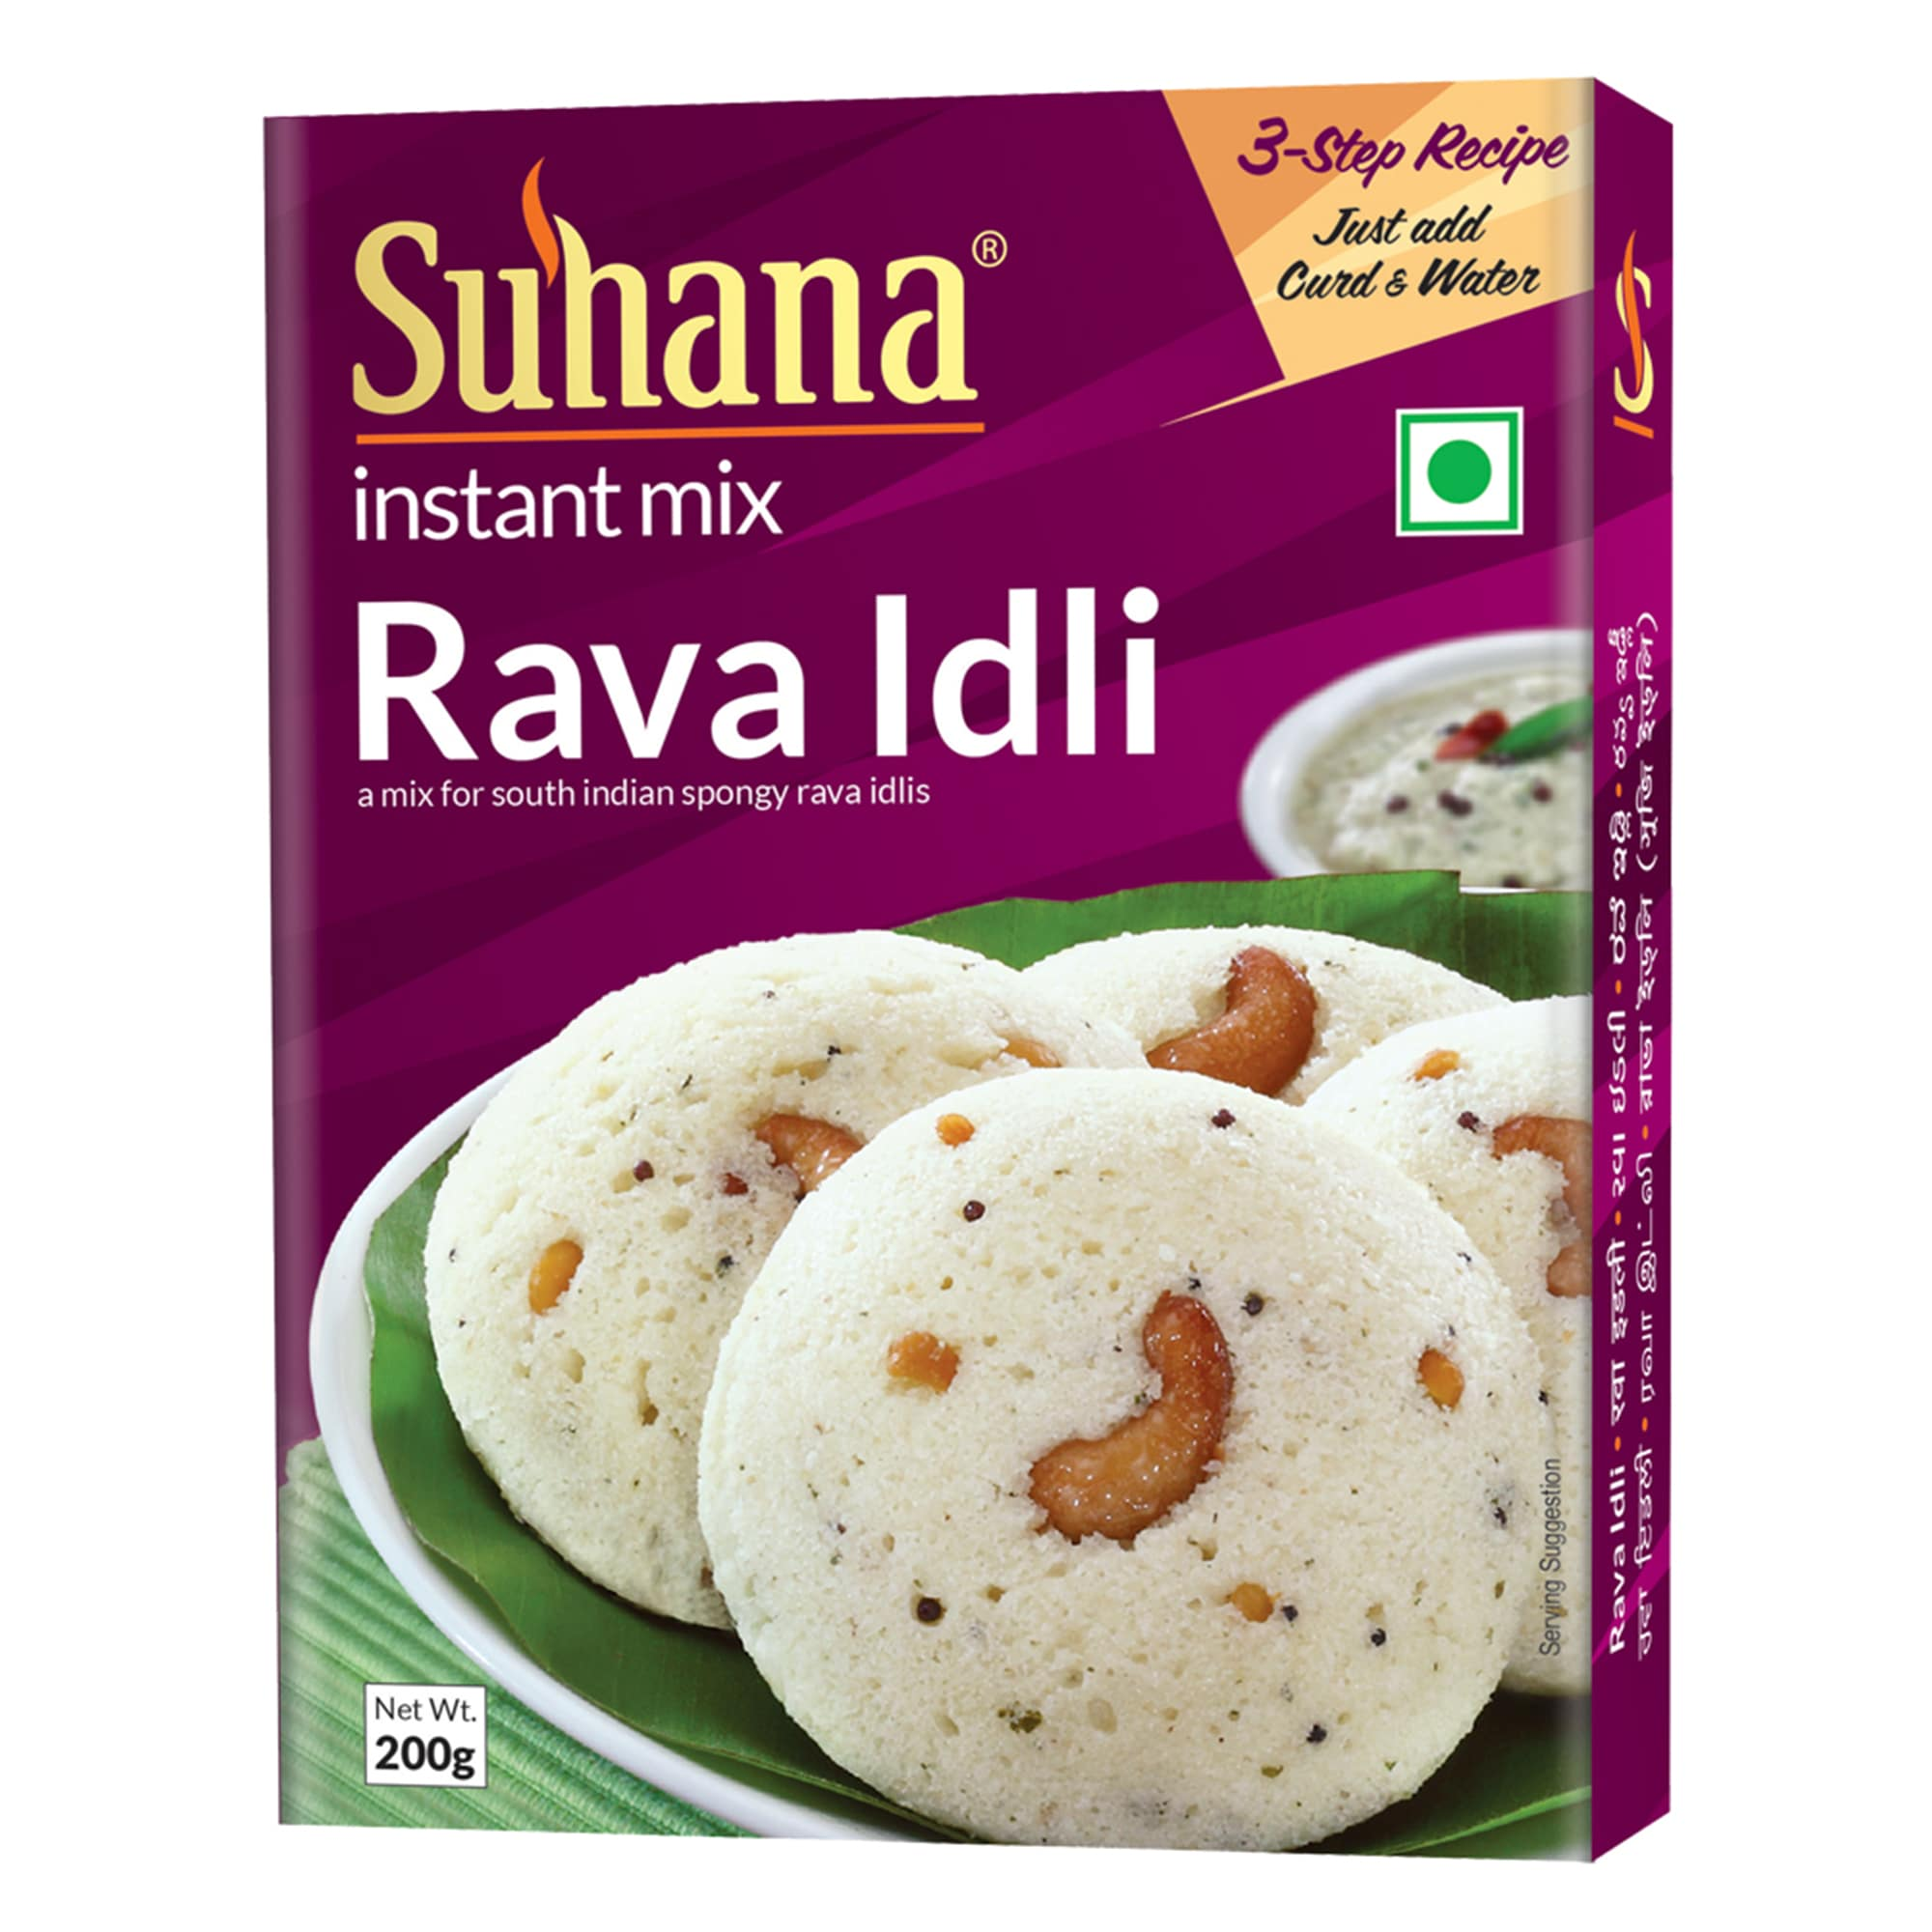 Suhana Rava Idli Mix 200g Box